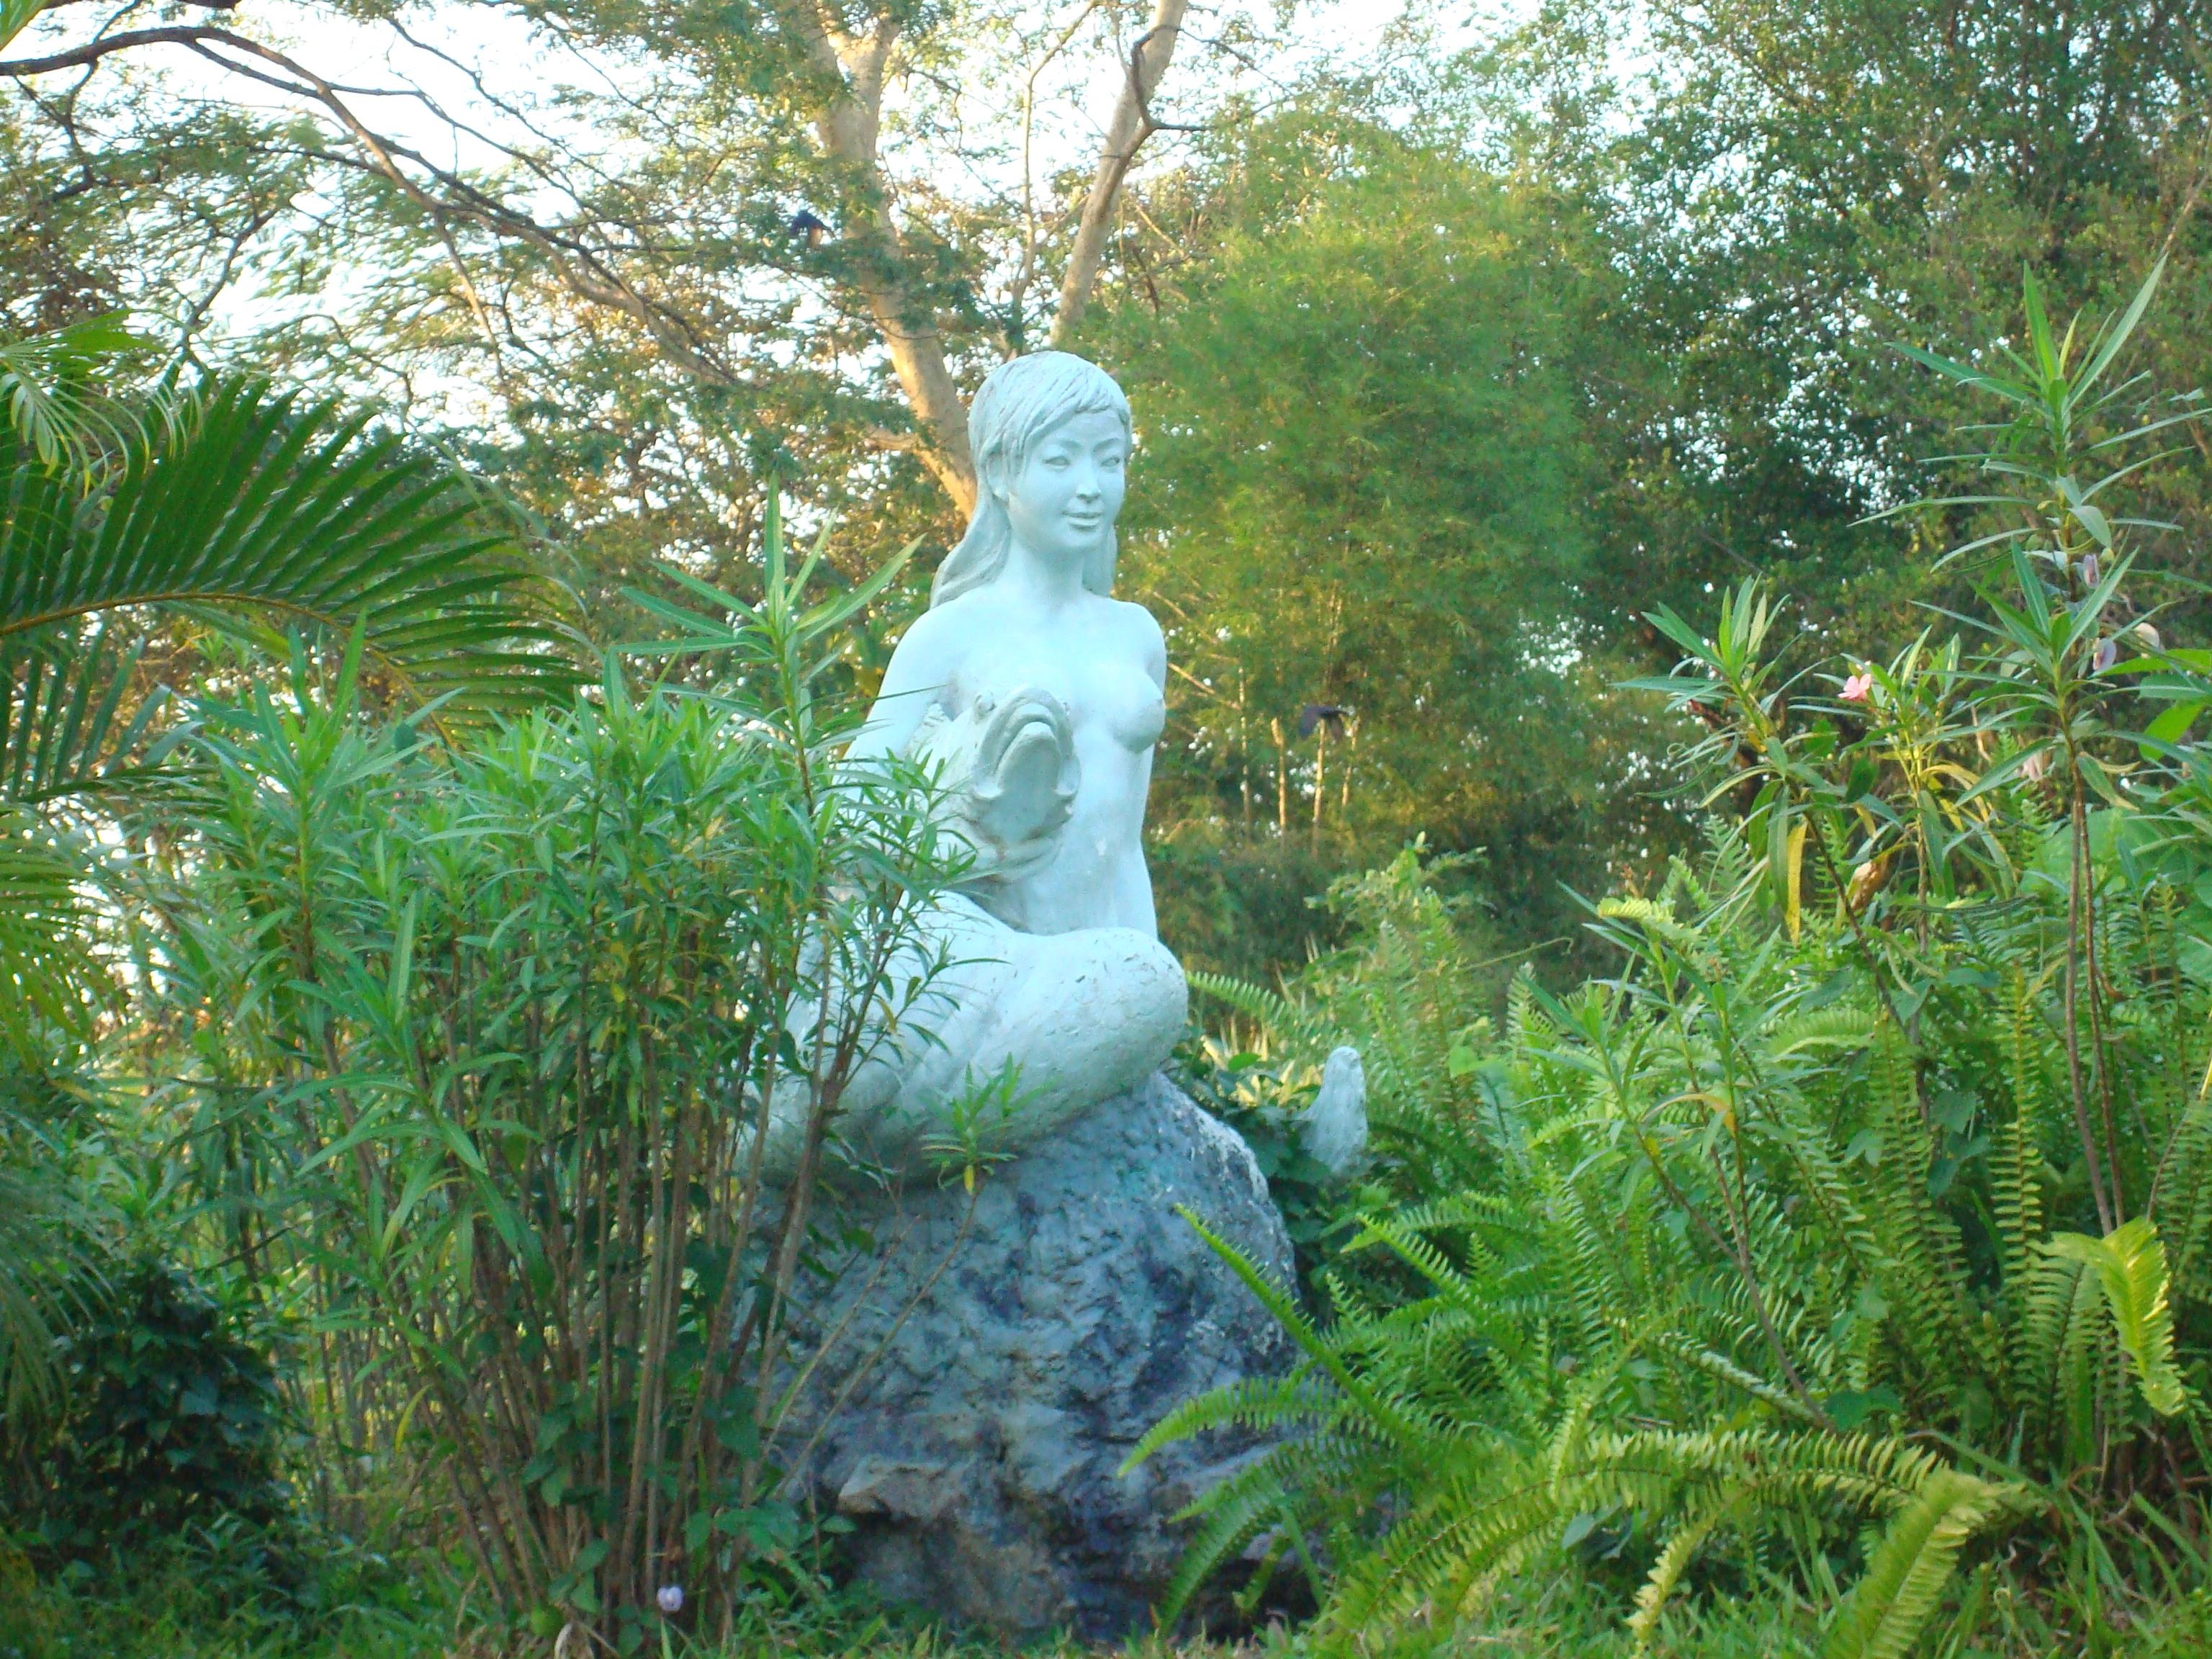 File:Mermaid Statue At Kandawgyi Garden.JPG